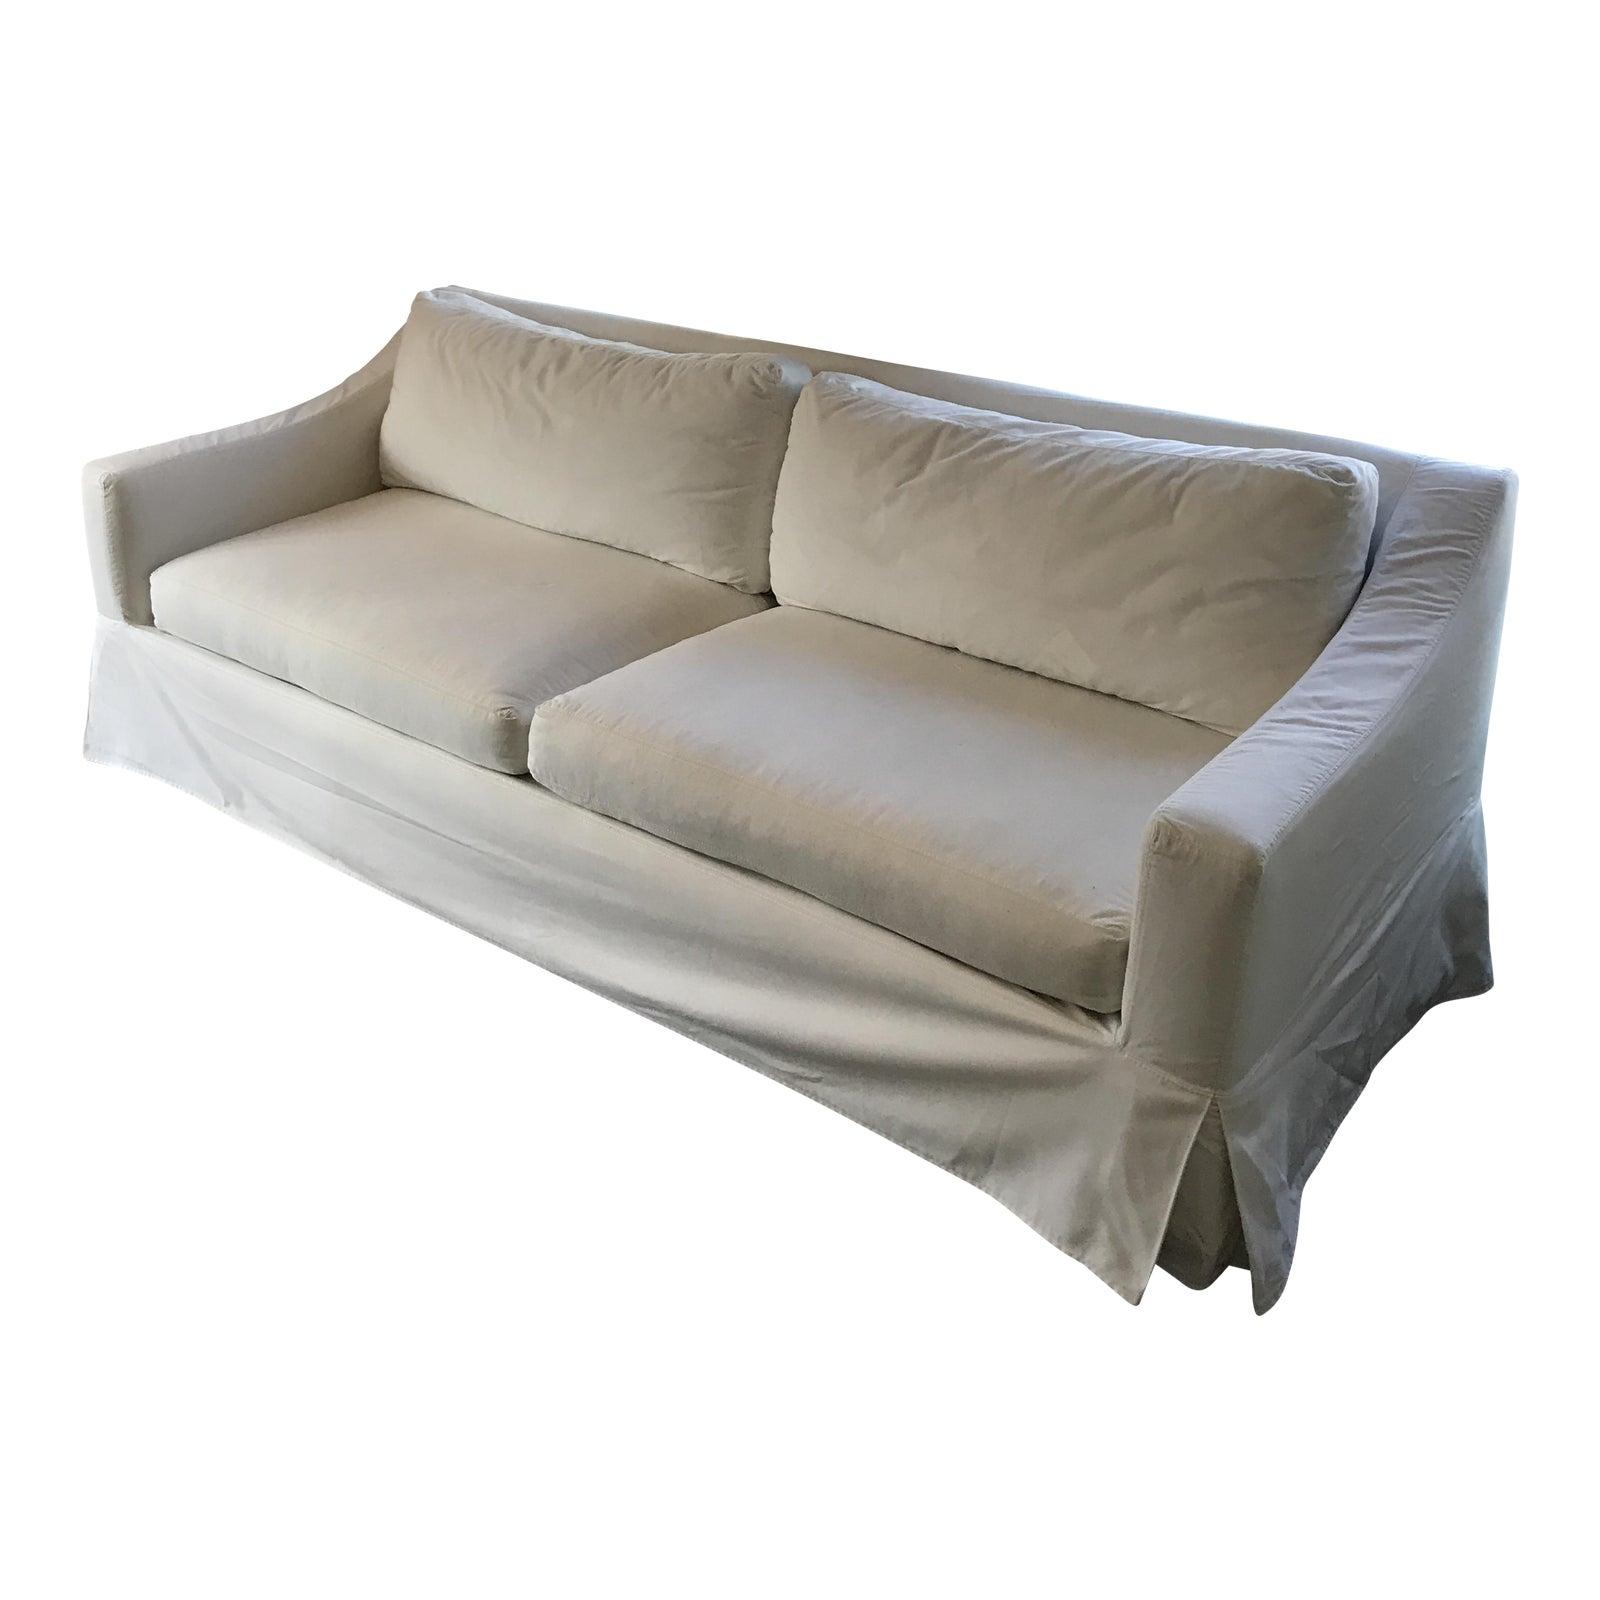 Pottery Barn York Slope Arm Slipcovered Sofa Chairish